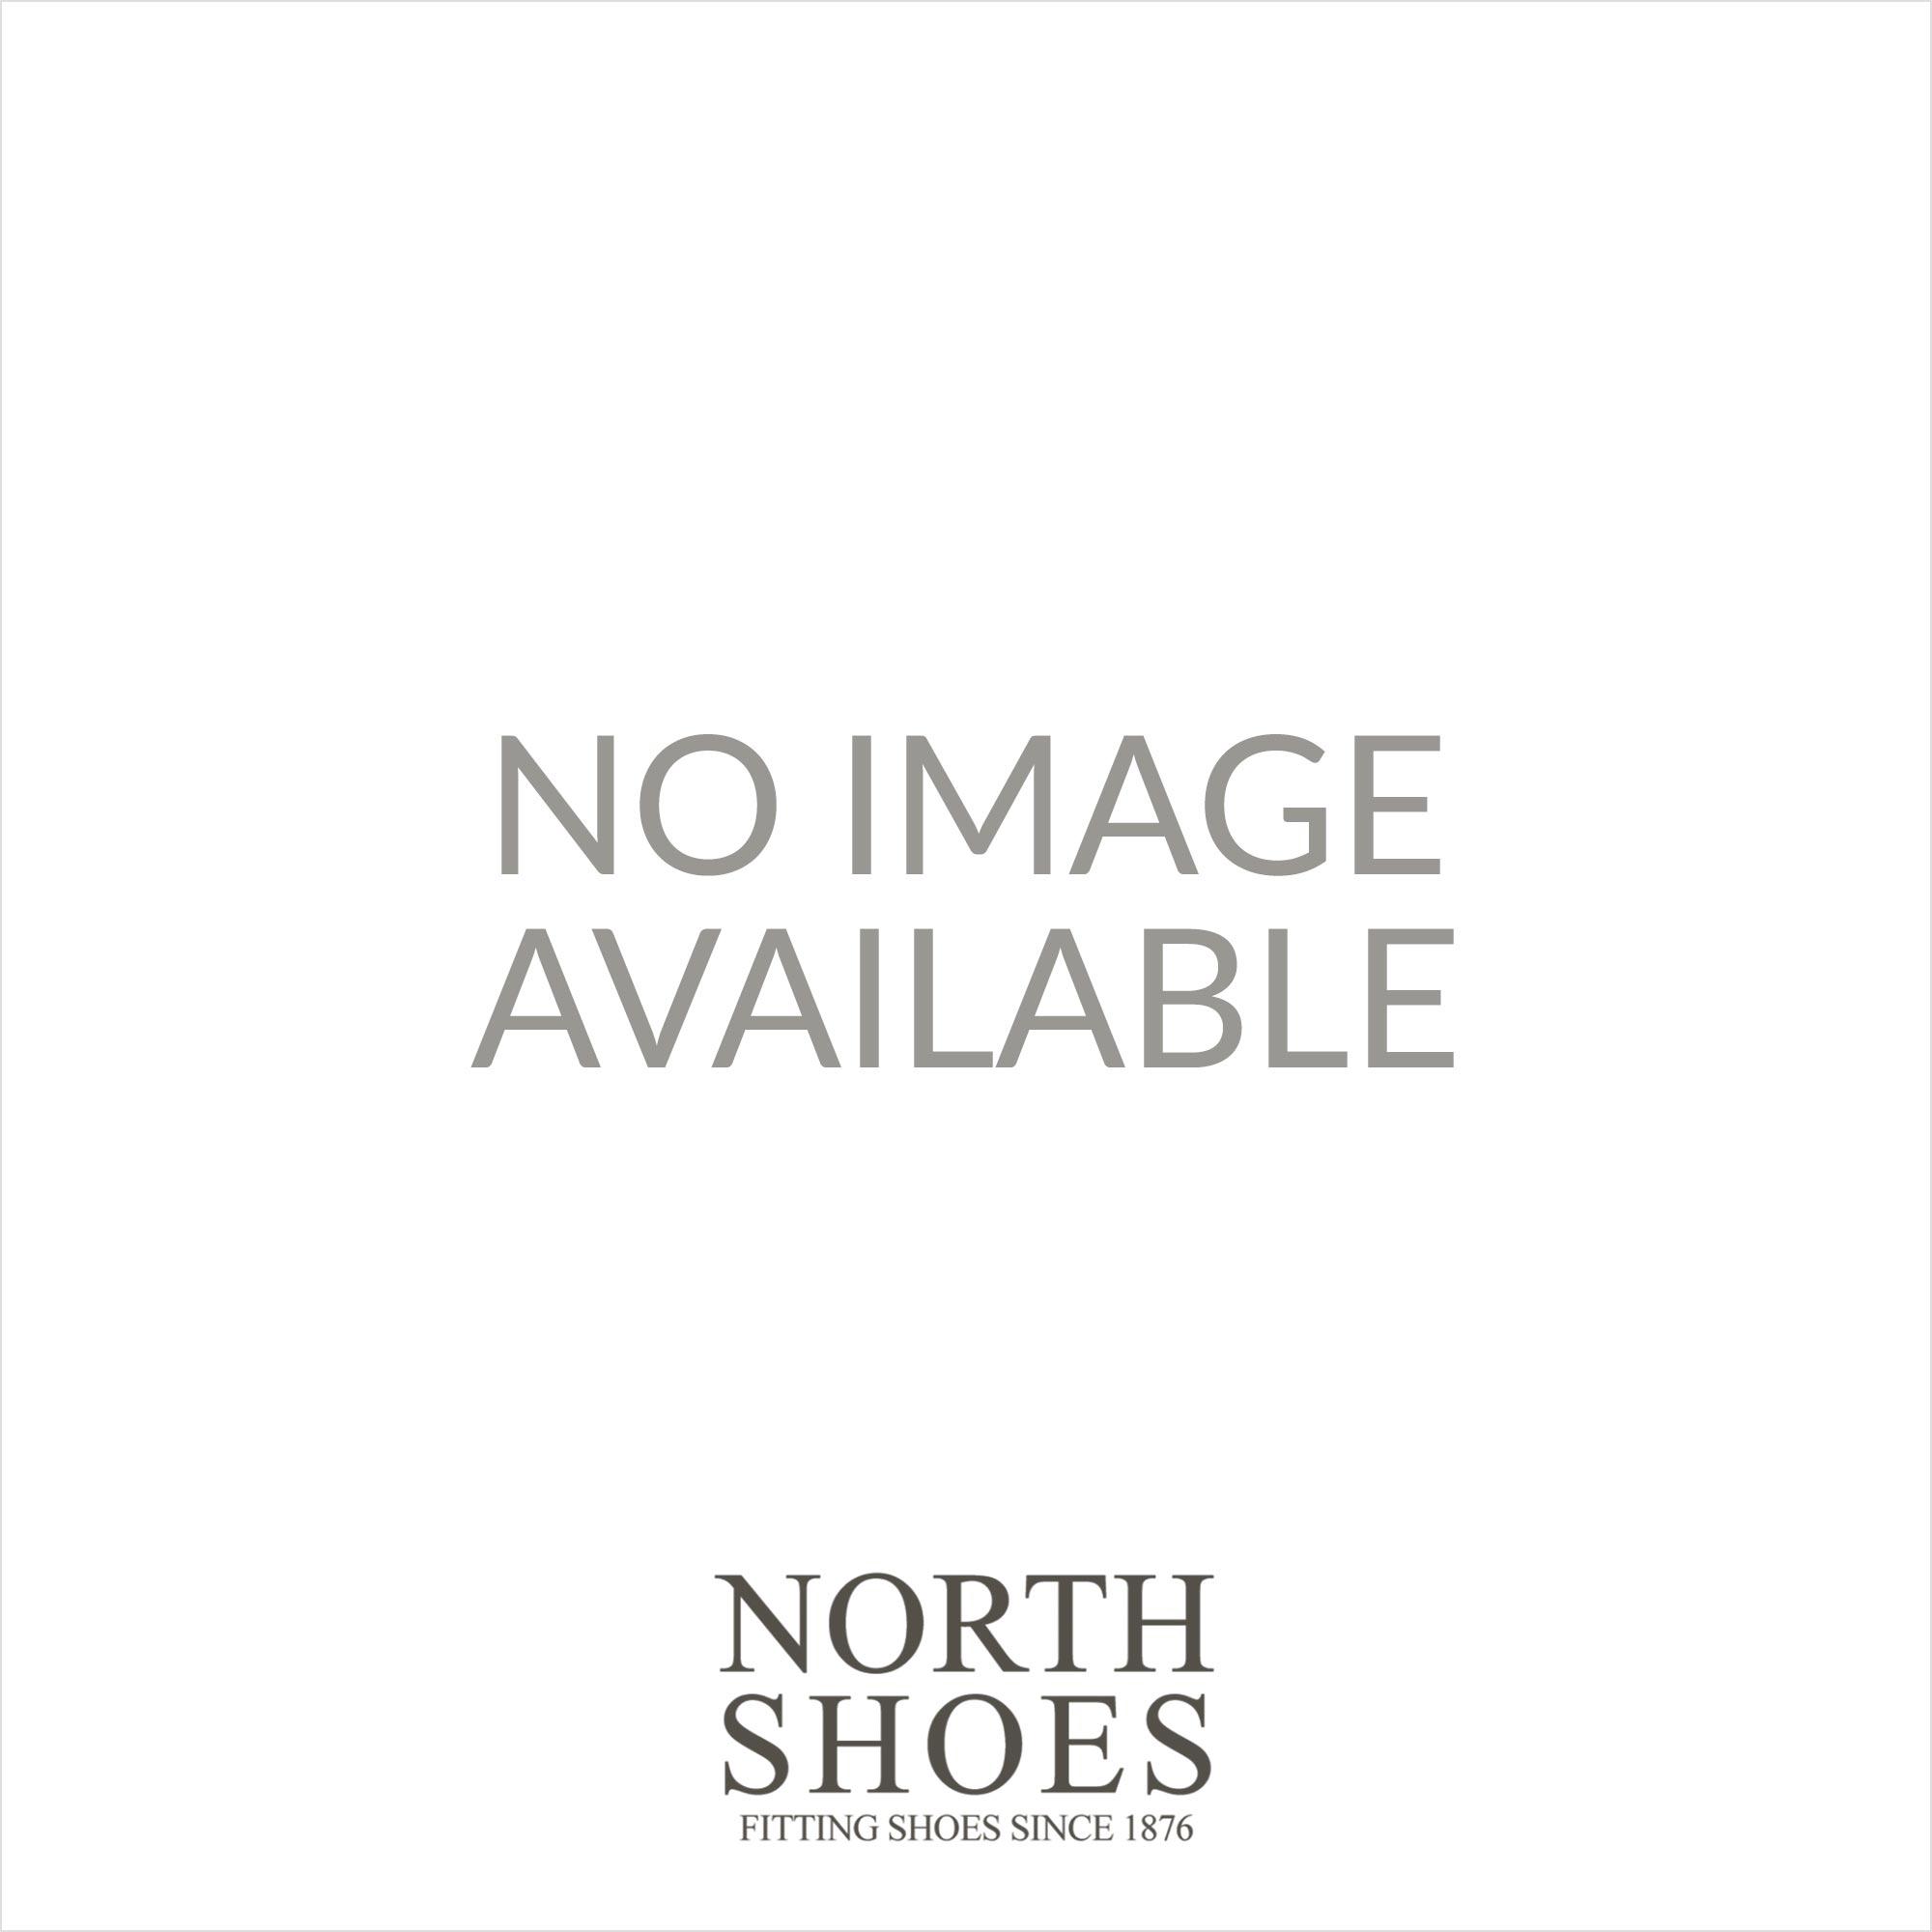 109645a5b98c Skechers 14680 Purple Rubber Womens Toe Post Flip Flop Sandal - Skechers  from North Shoes UK